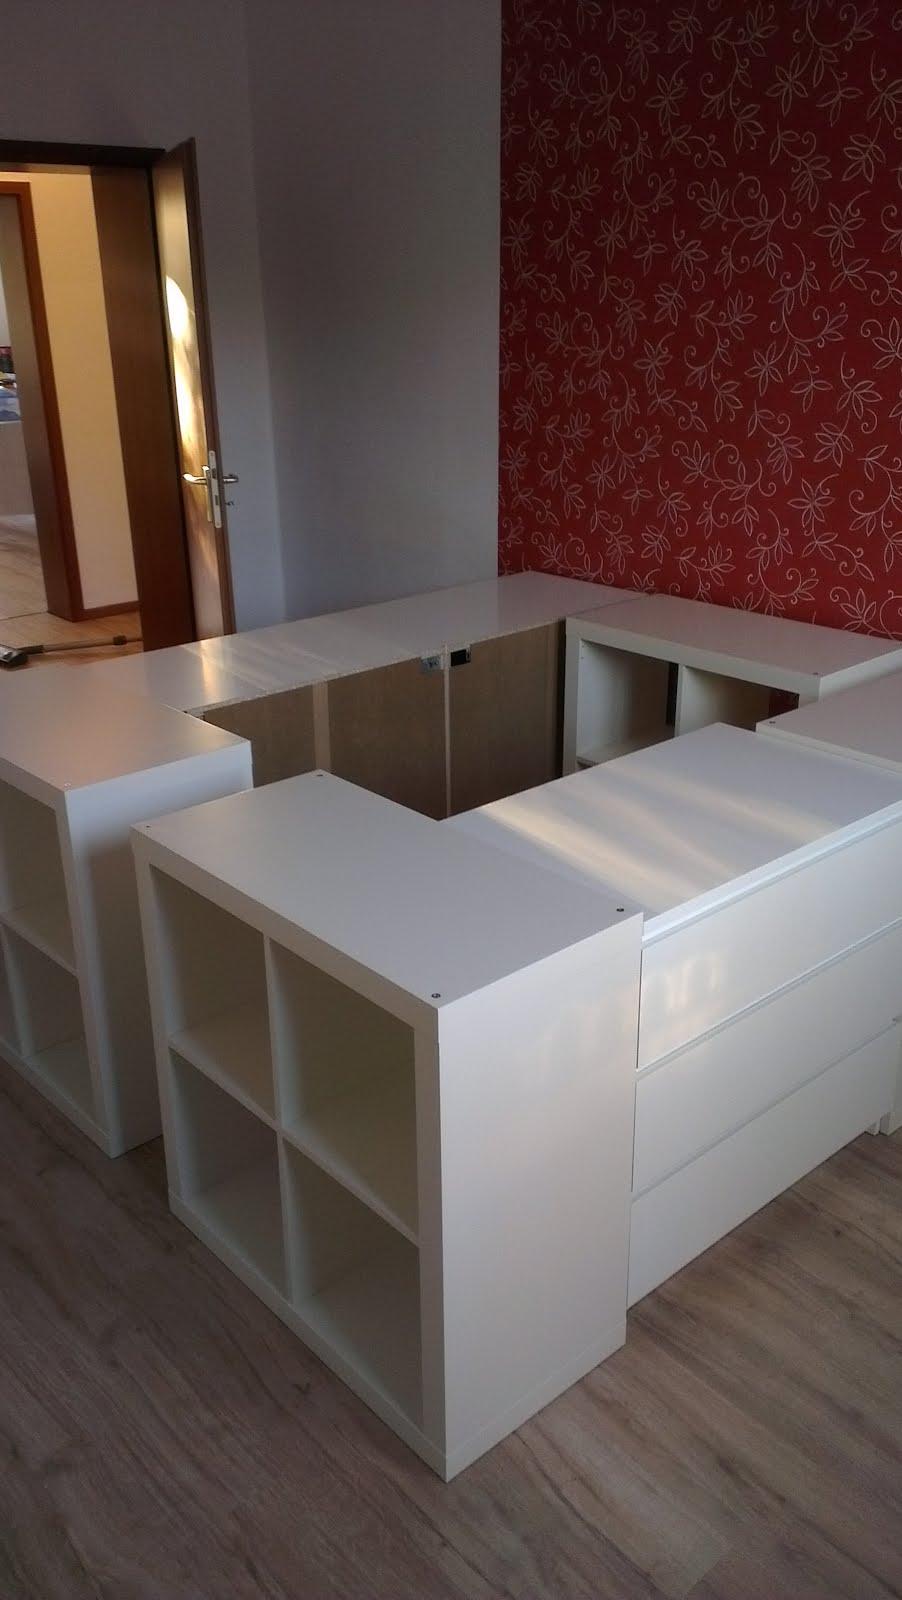 Half a loft bed ikea hackers ikea hackers - Fabriquer un lit avec rangement ...